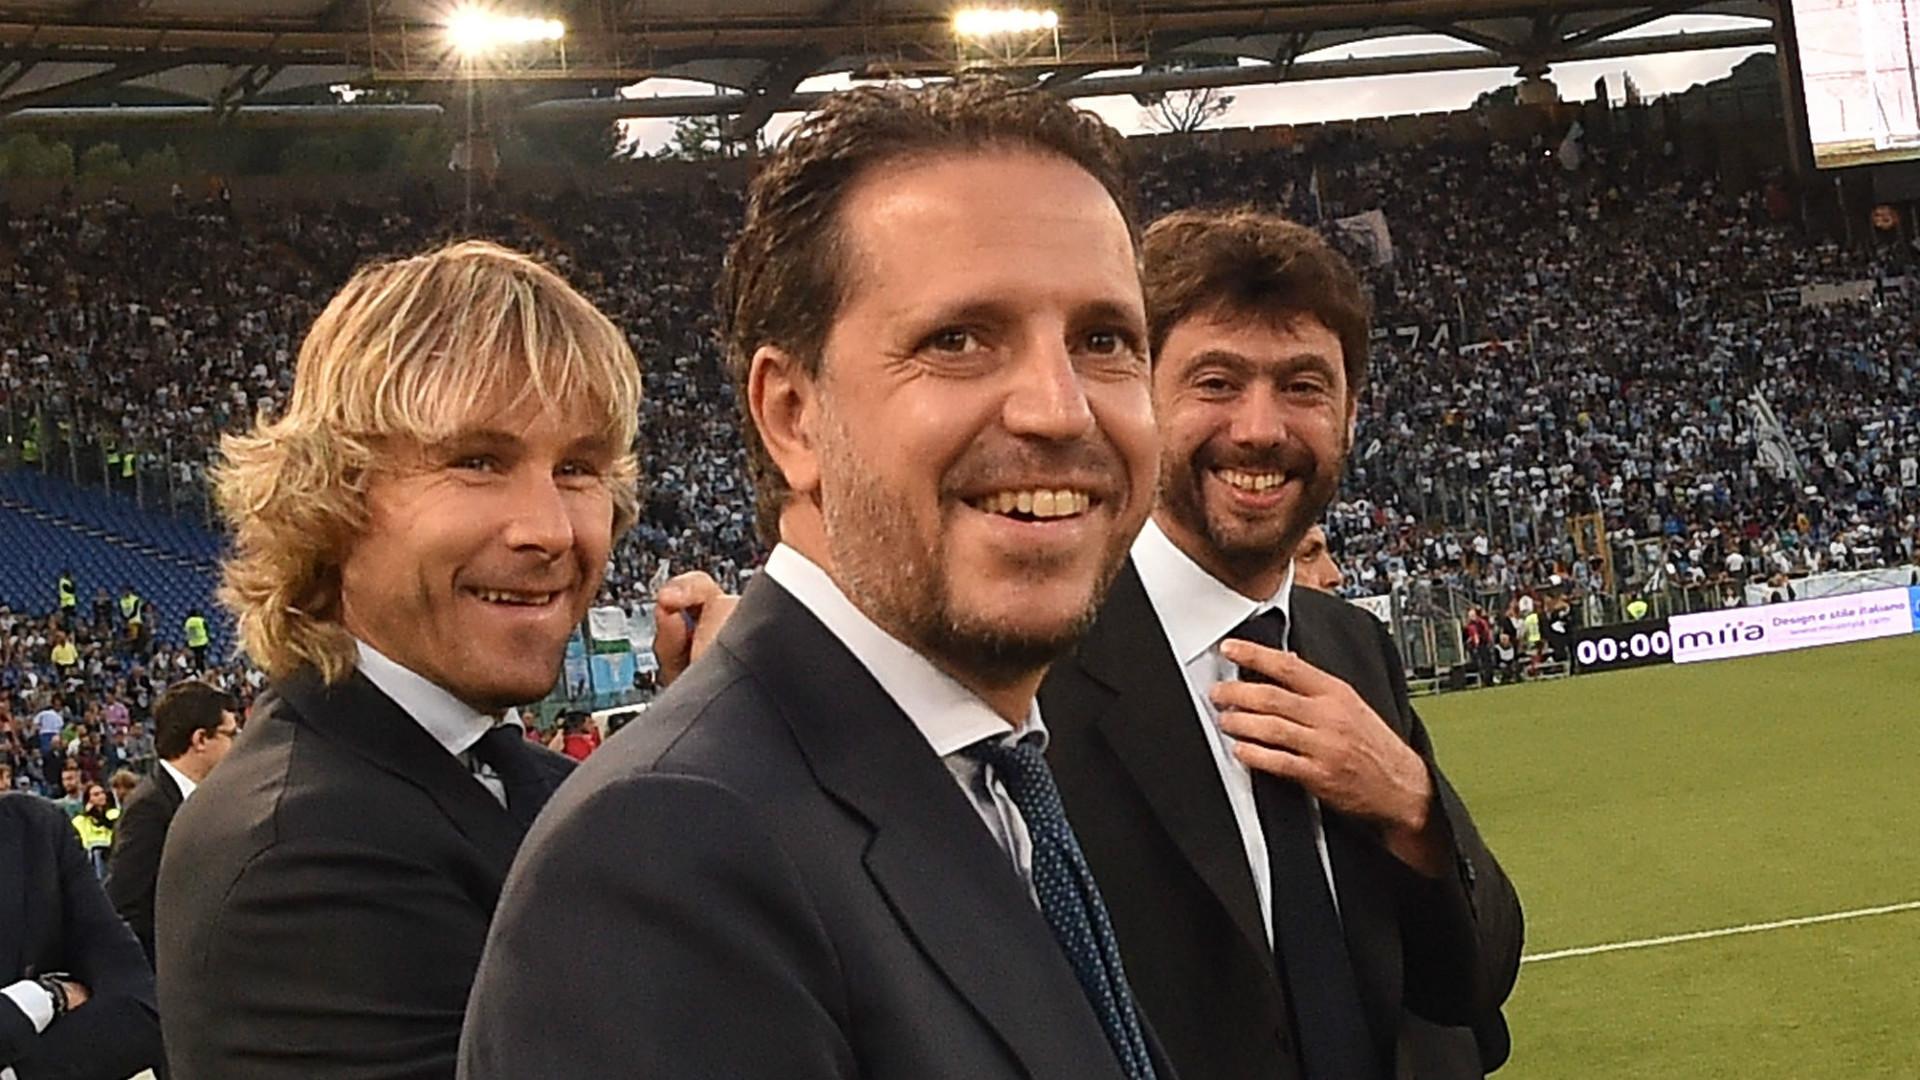 Insulti al Var: Inibito Paratici, ds della Juventus